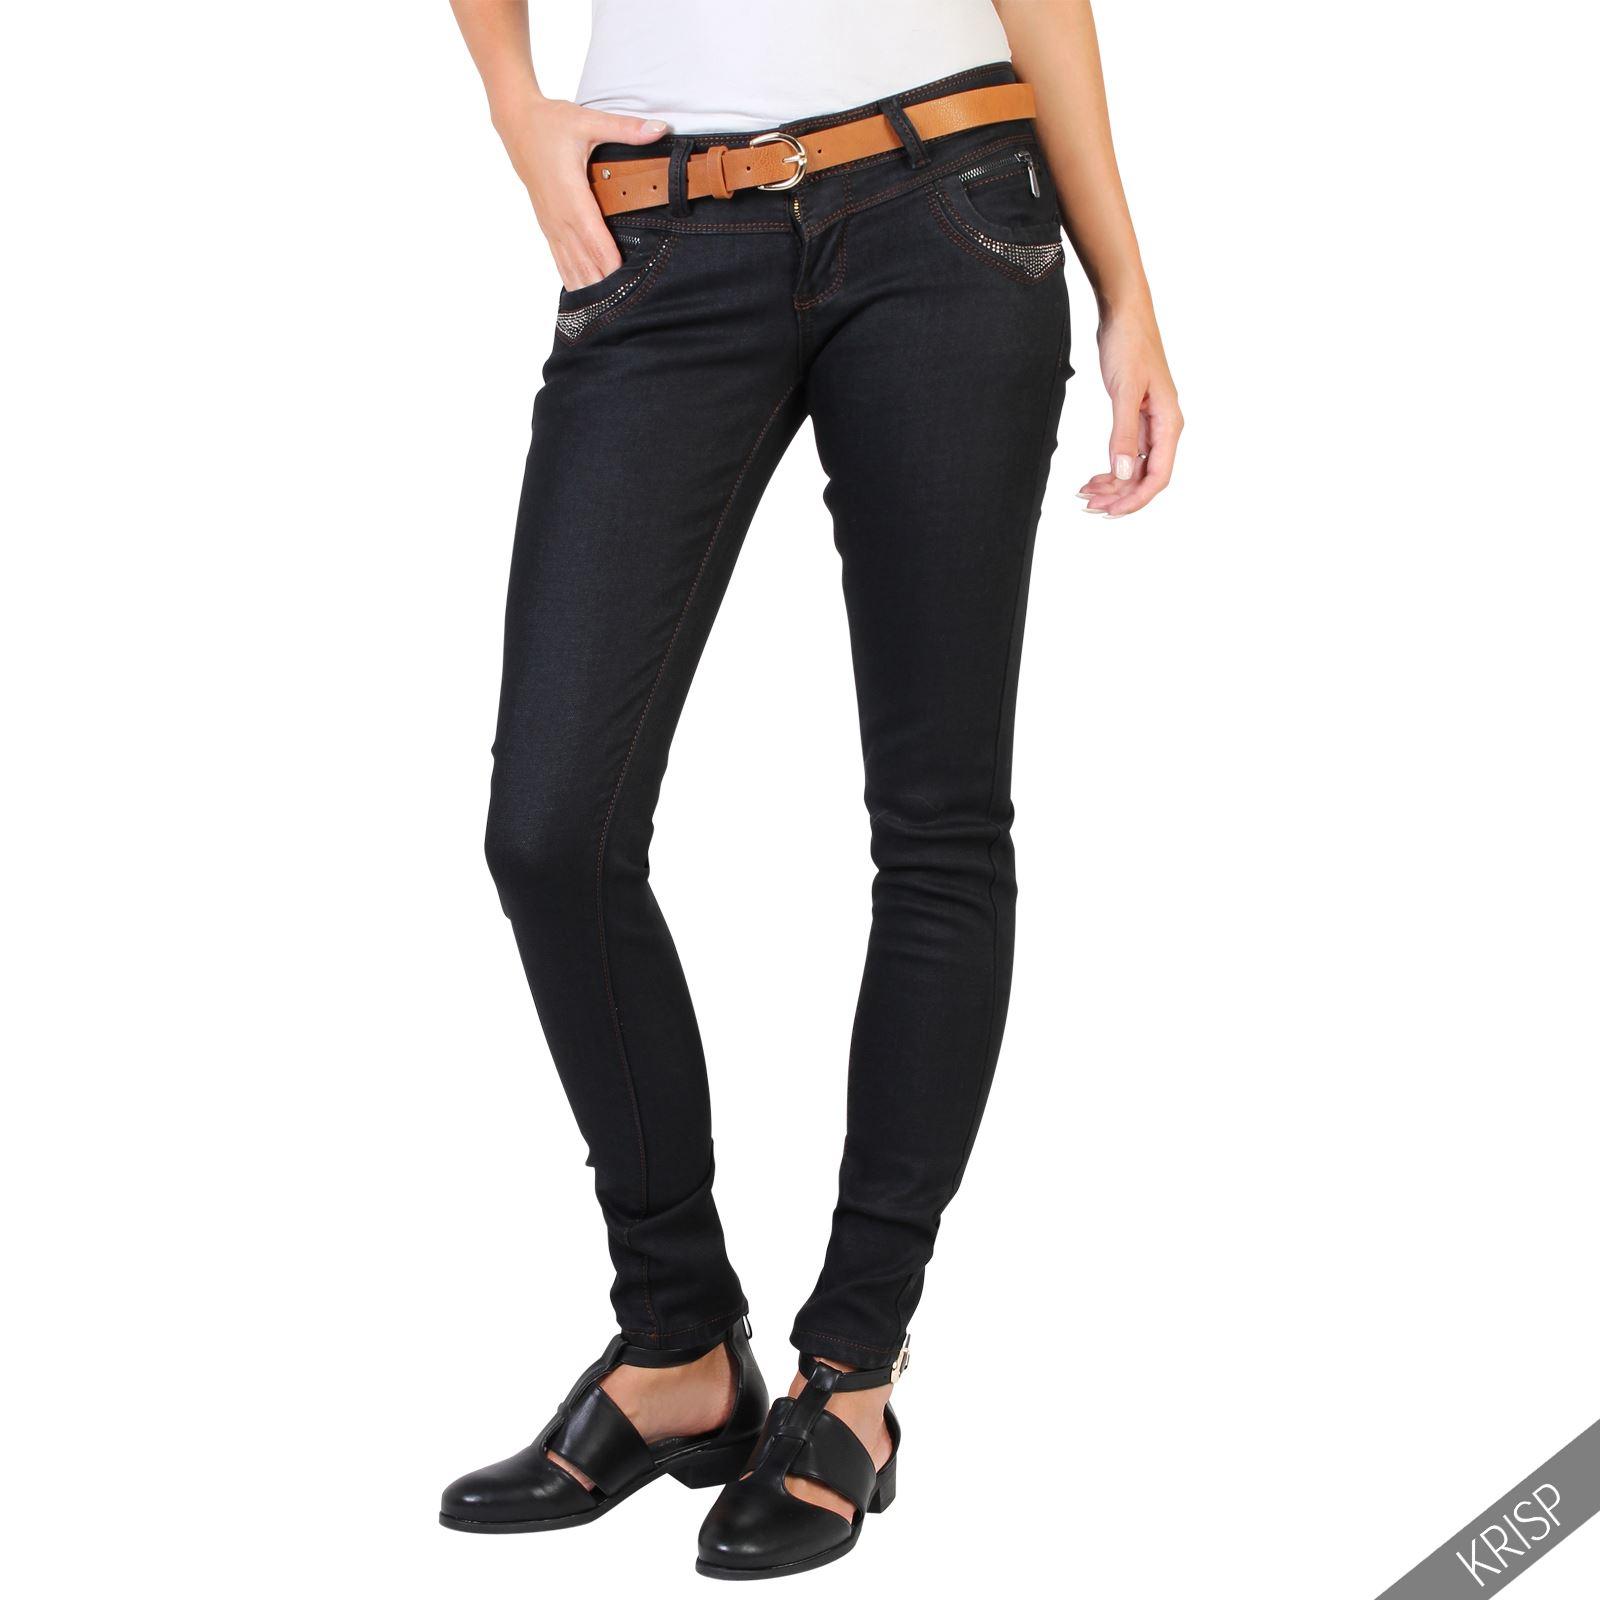 femmes jeans skinny noir strass poches ceinture camel fine pantalon slim casual ebay. Black Bedroom Furniture Sets. Home Design Ideas